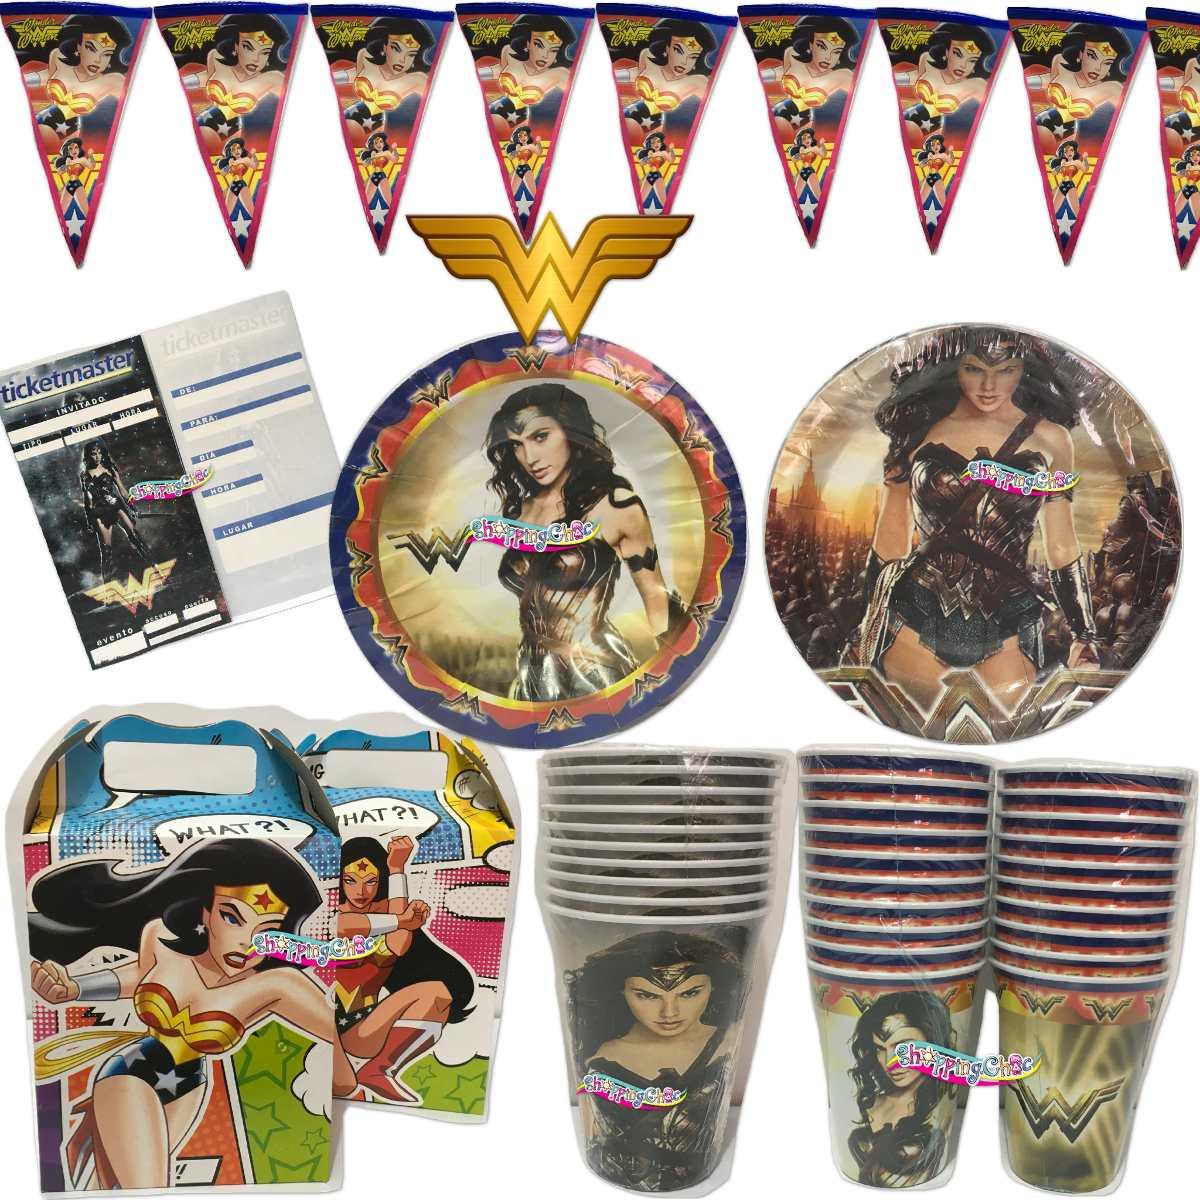 Mujer Maravilla Wonder Woman Fiesta Arts Platos O Vasos O - $ 35.00 ...